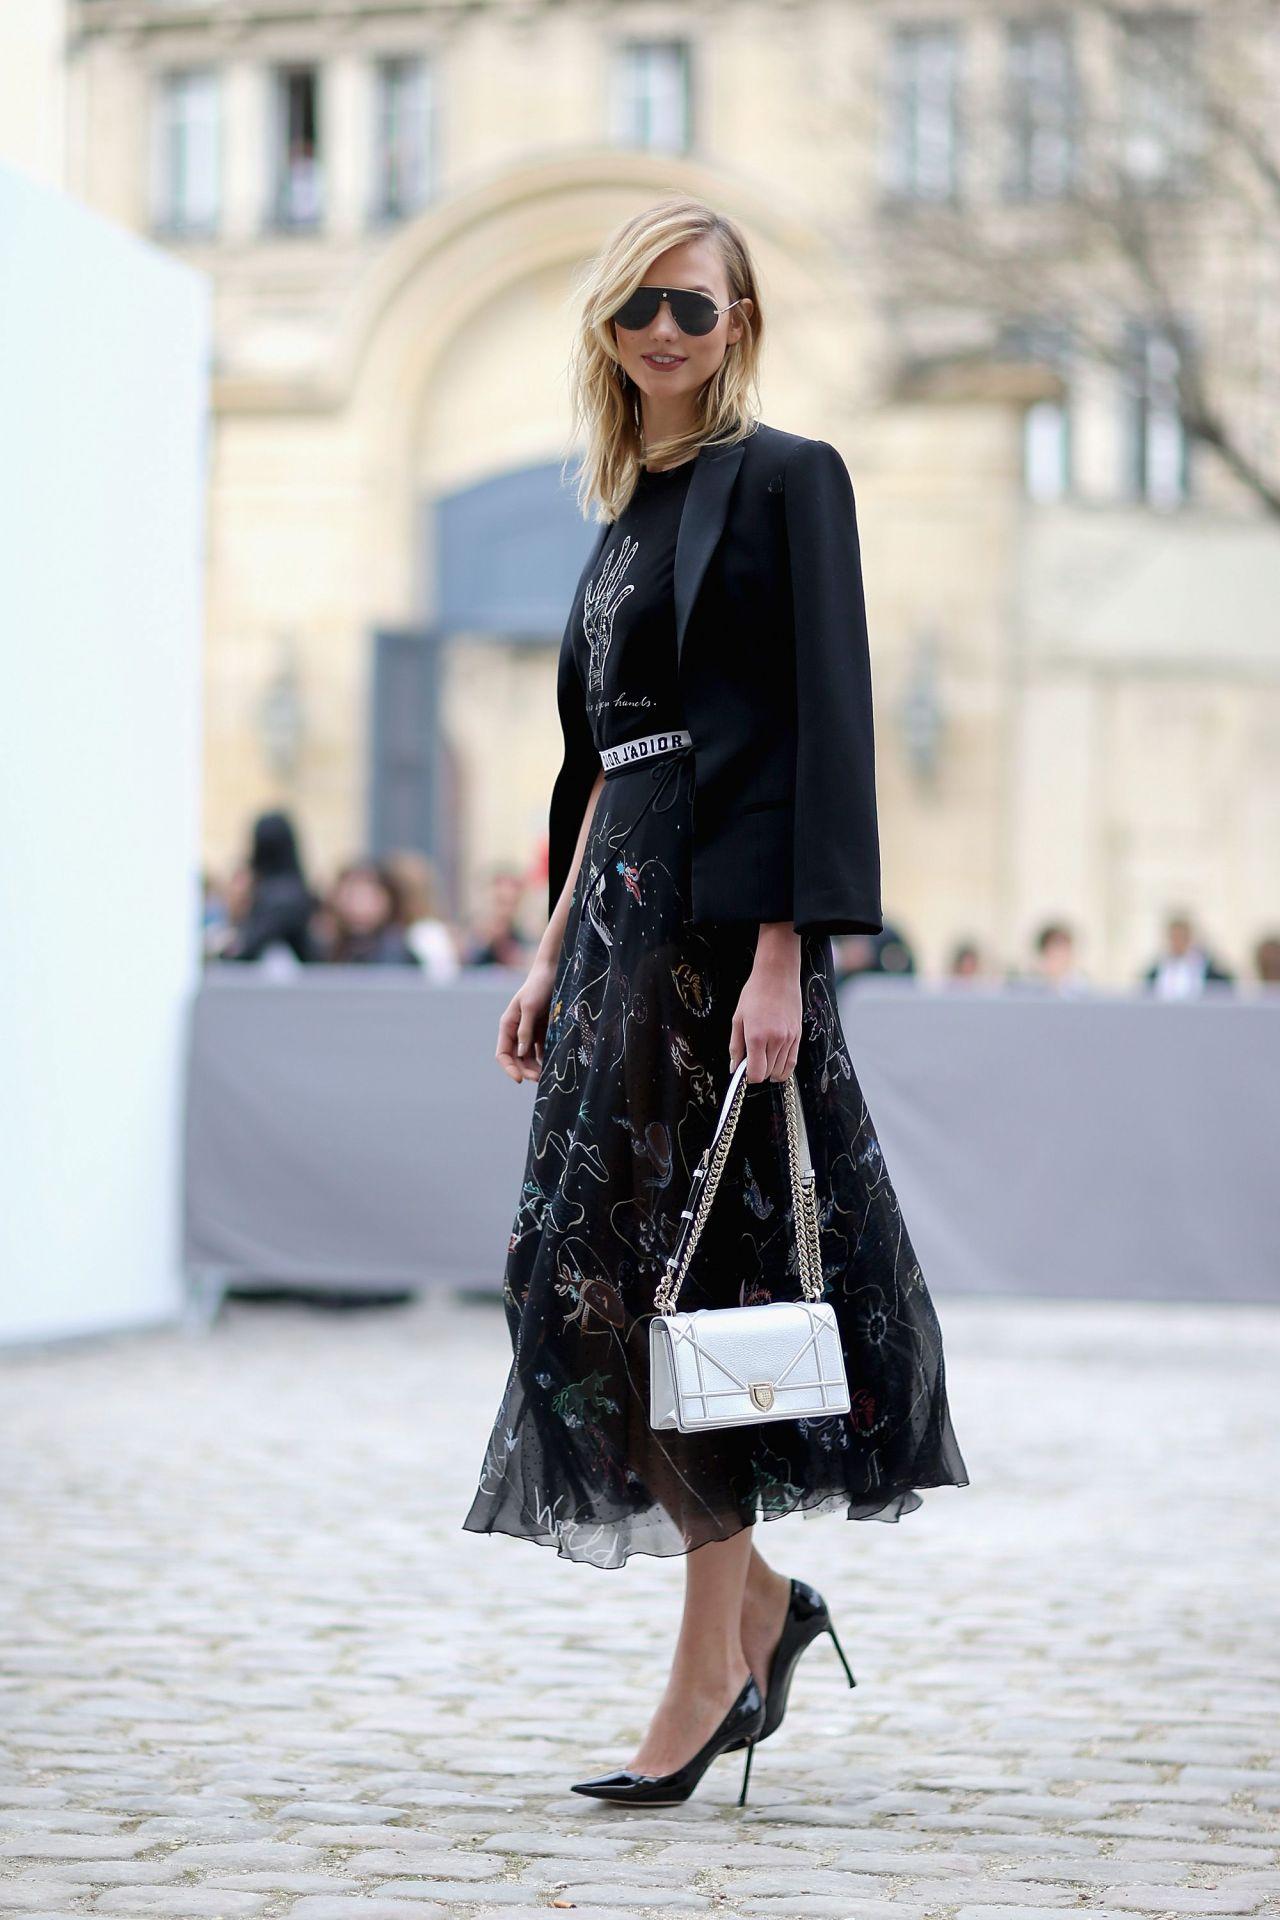 Fall Daisy Wallpaper Karlie Kloss At Paris Fashion Week Christian Dior Show 3